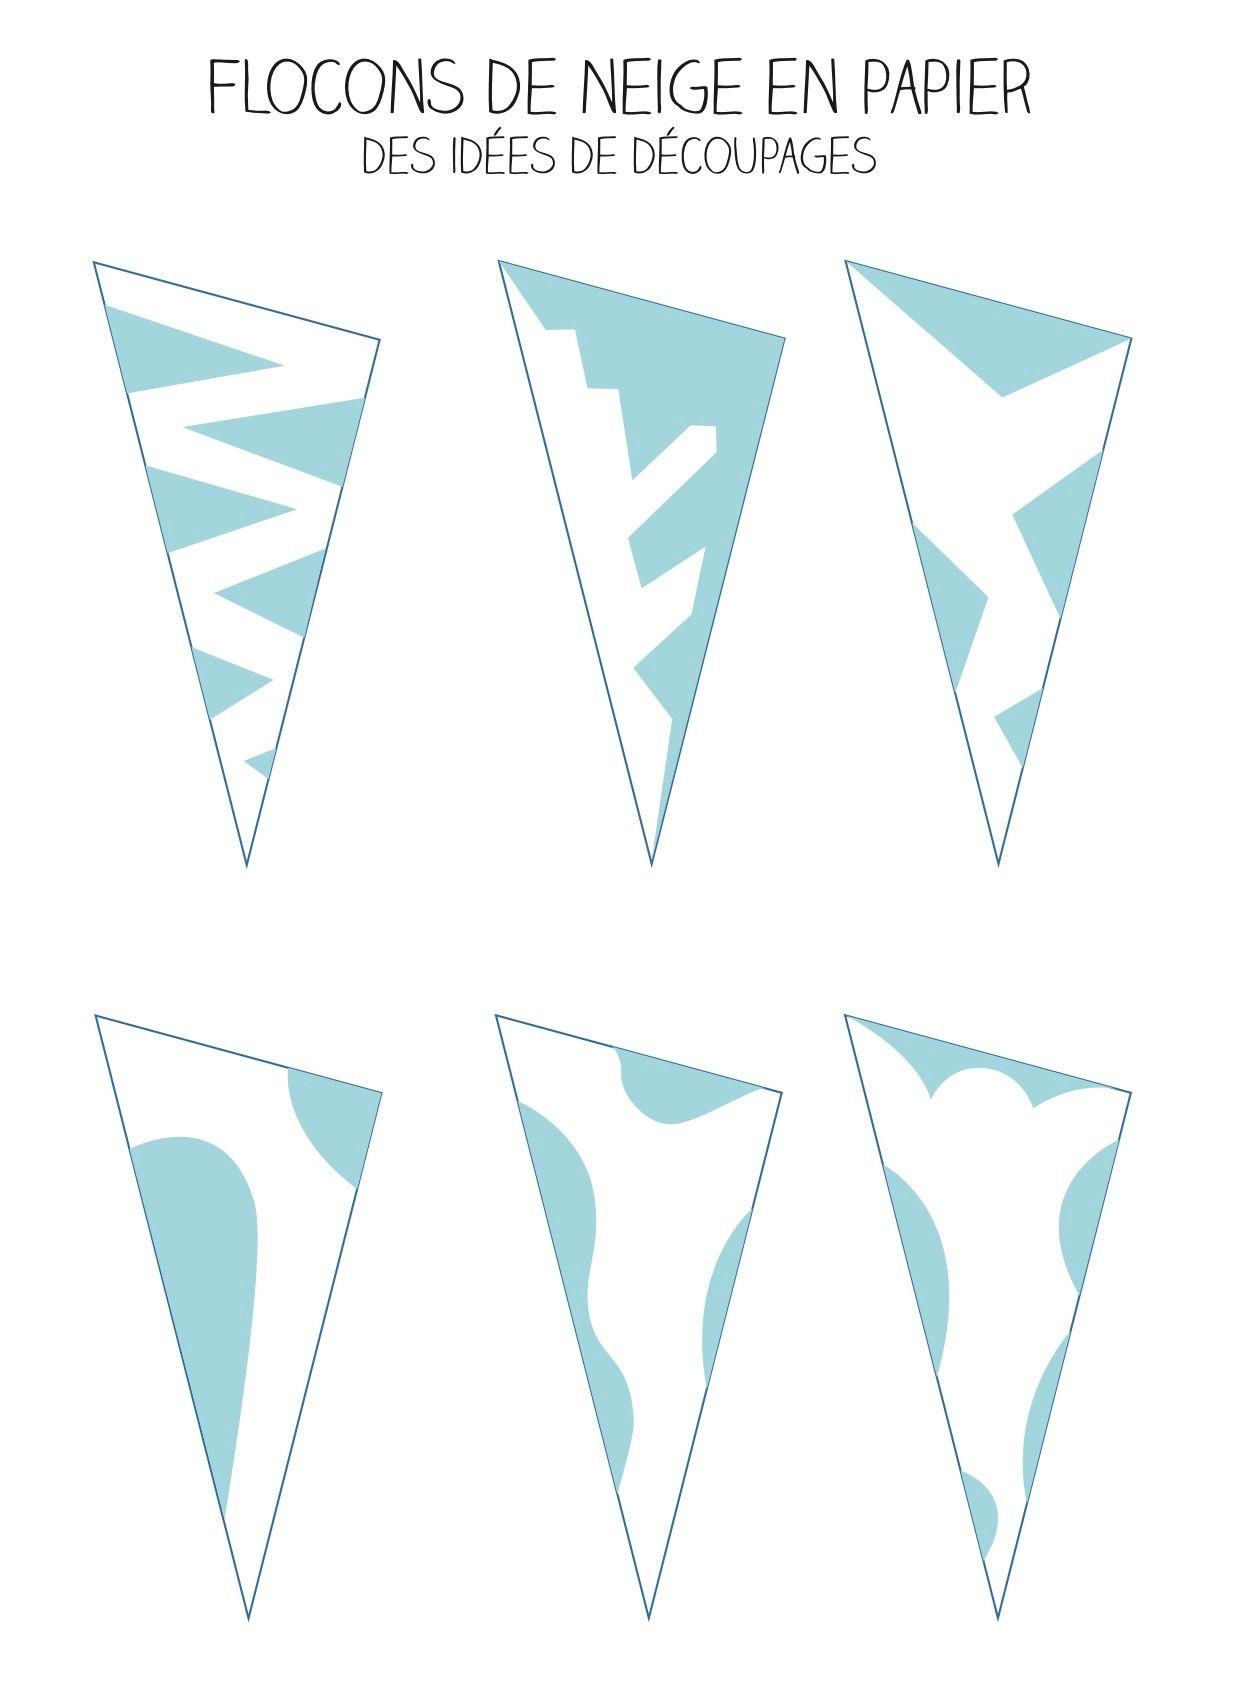 Deco Flocon De Neige Et Origami Flocon En Papier Clemaroundthecorner Flocon De Neige Flocon En Papier Flocons De Neige En Papier